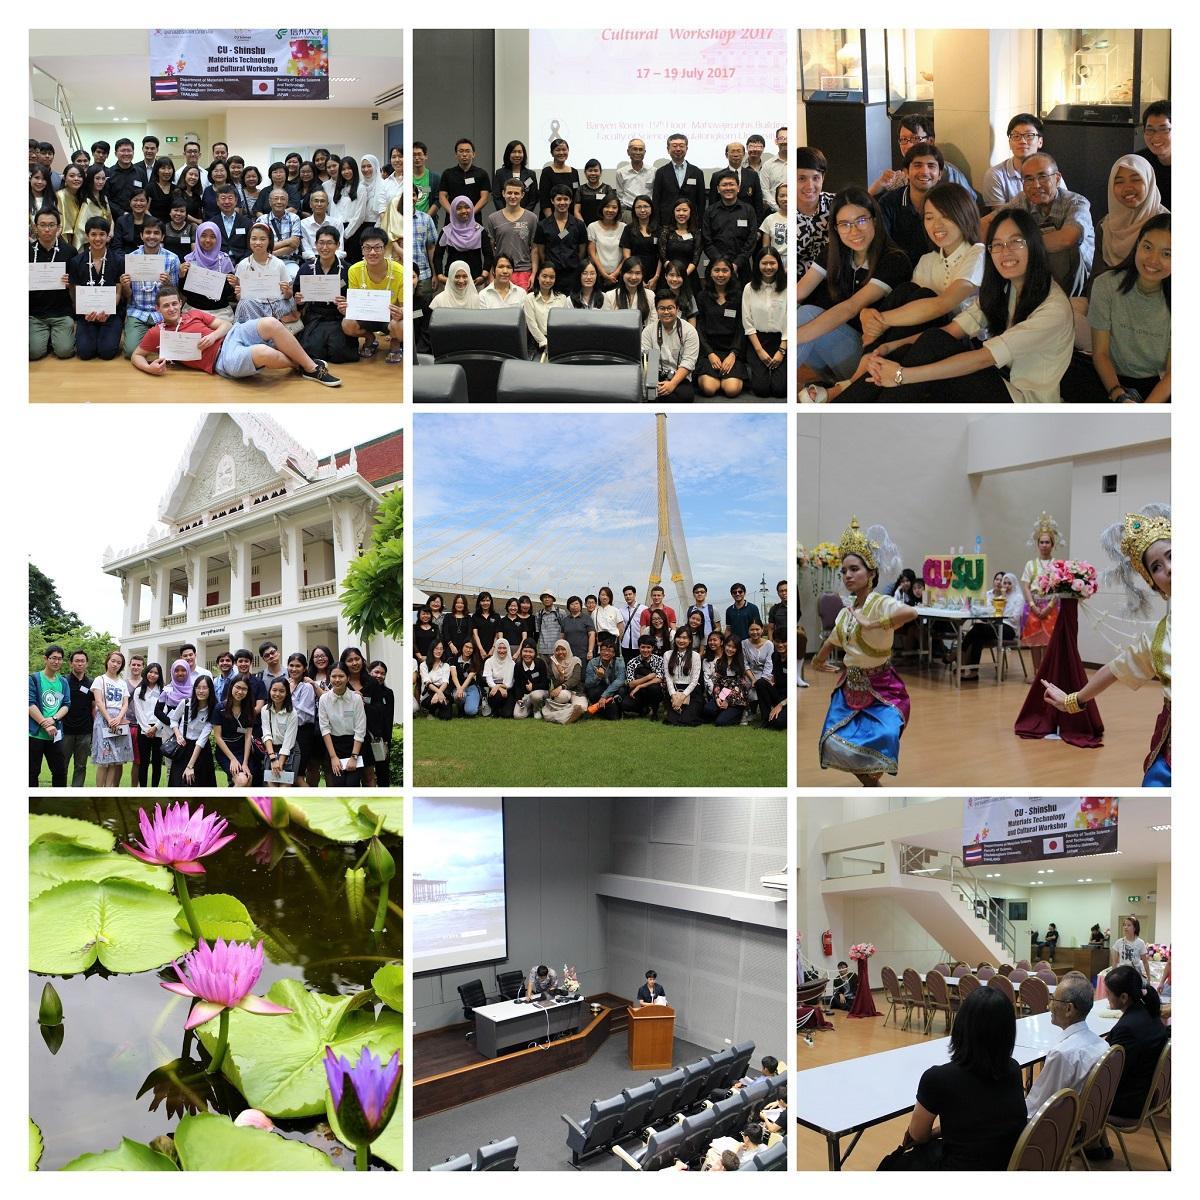 http://www.shinshu-u.ac.jp/project/leading/news/images/CU-SU%20Workshop%202017.jpg